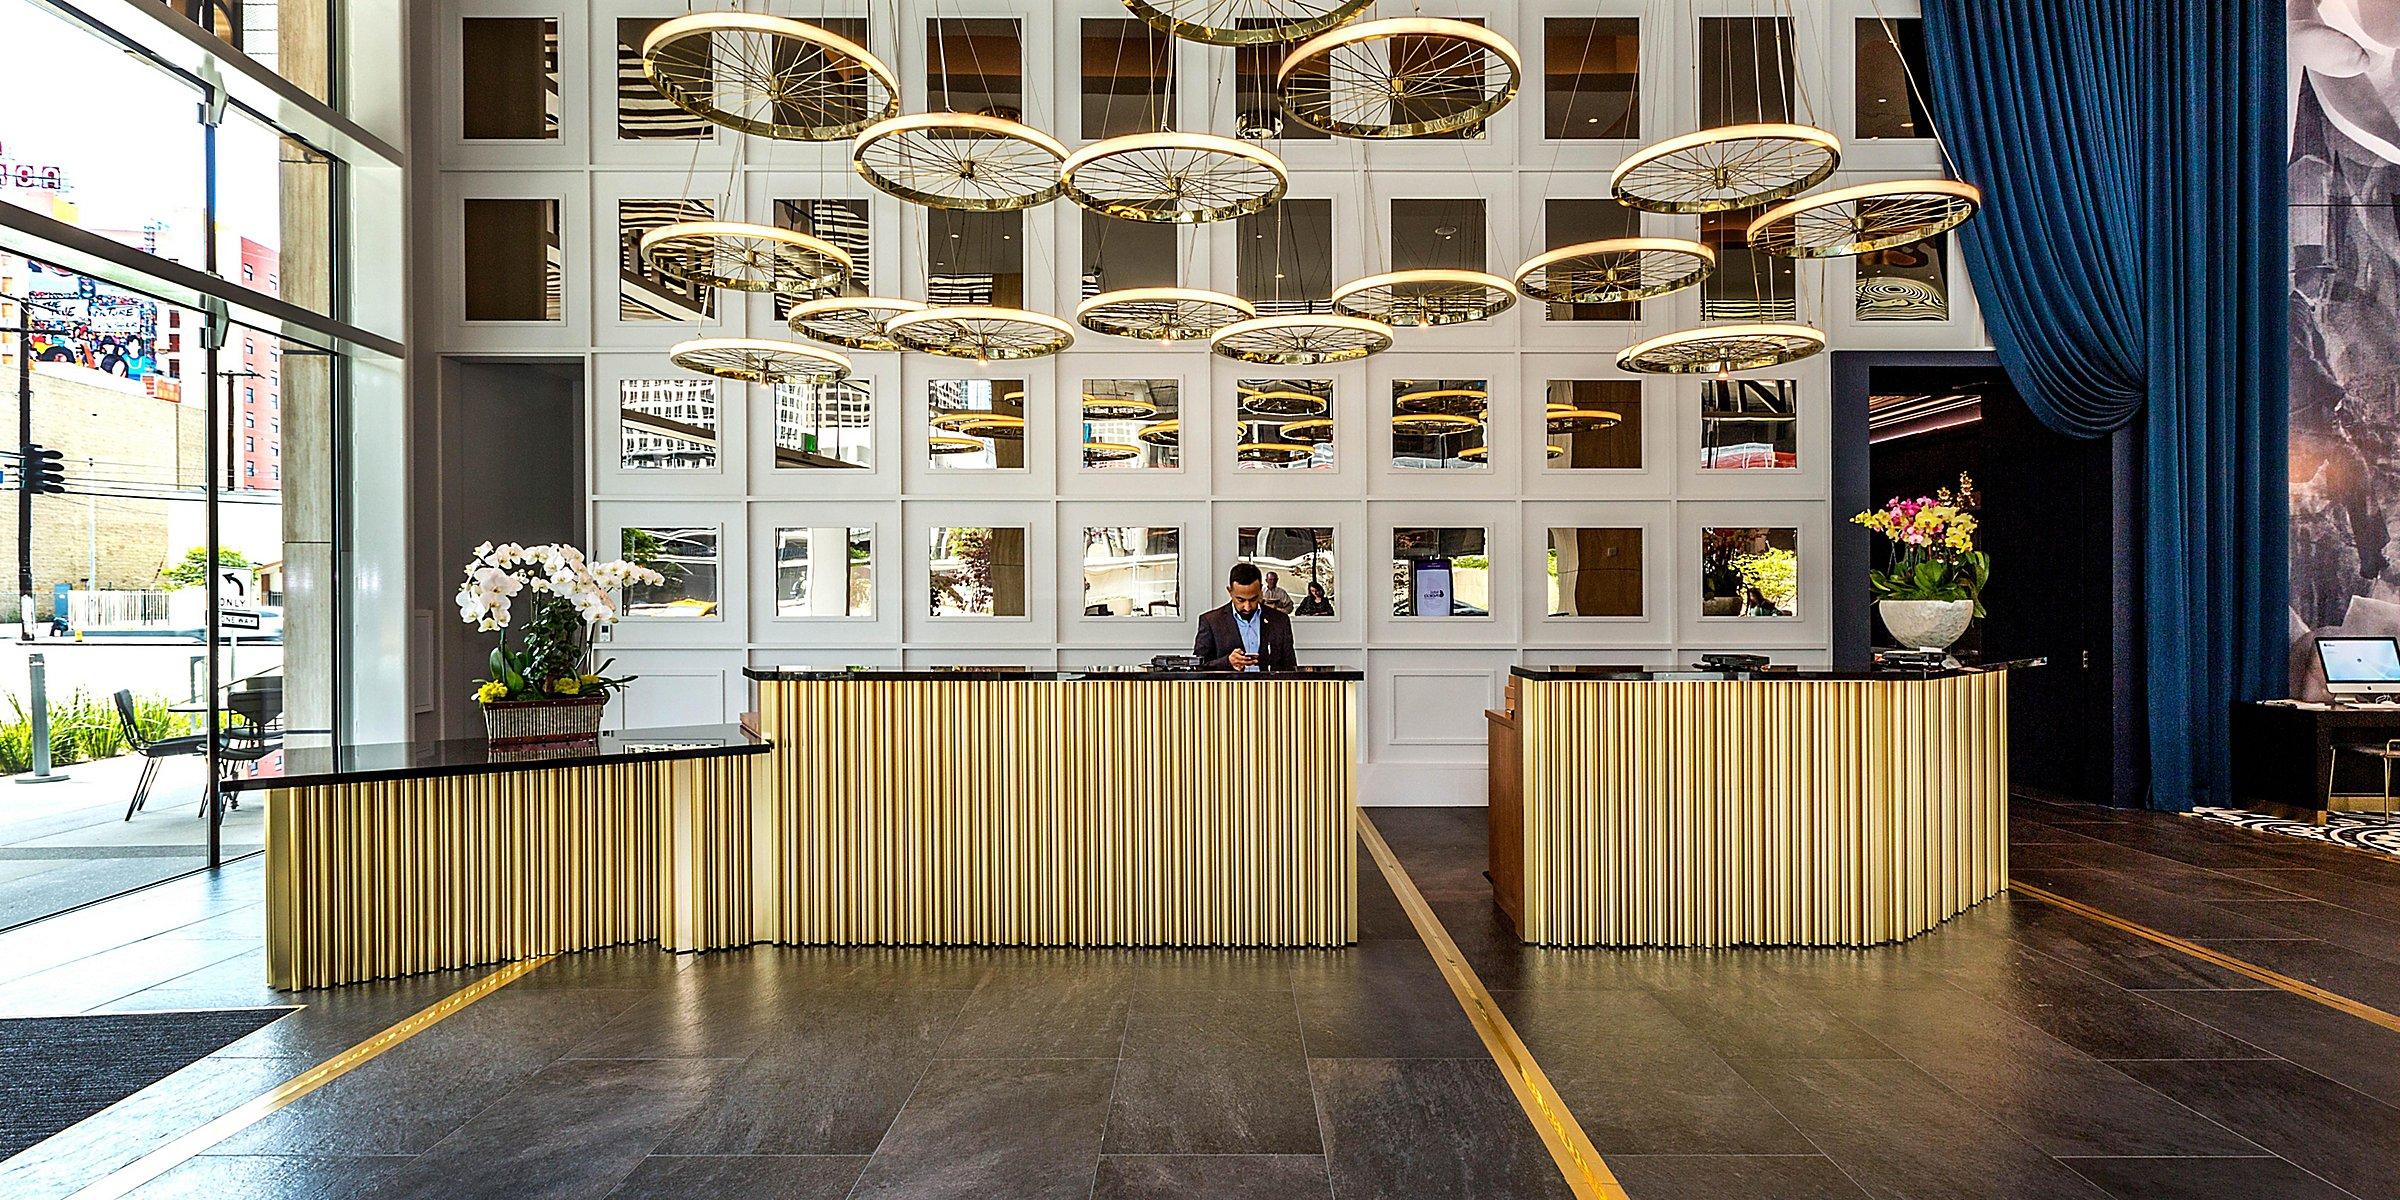 Fine Hotel Indigo Los Angeles Downtown La Boutique Hotels Near Download Free Architecture Designs Ogrambritishbridgeorg